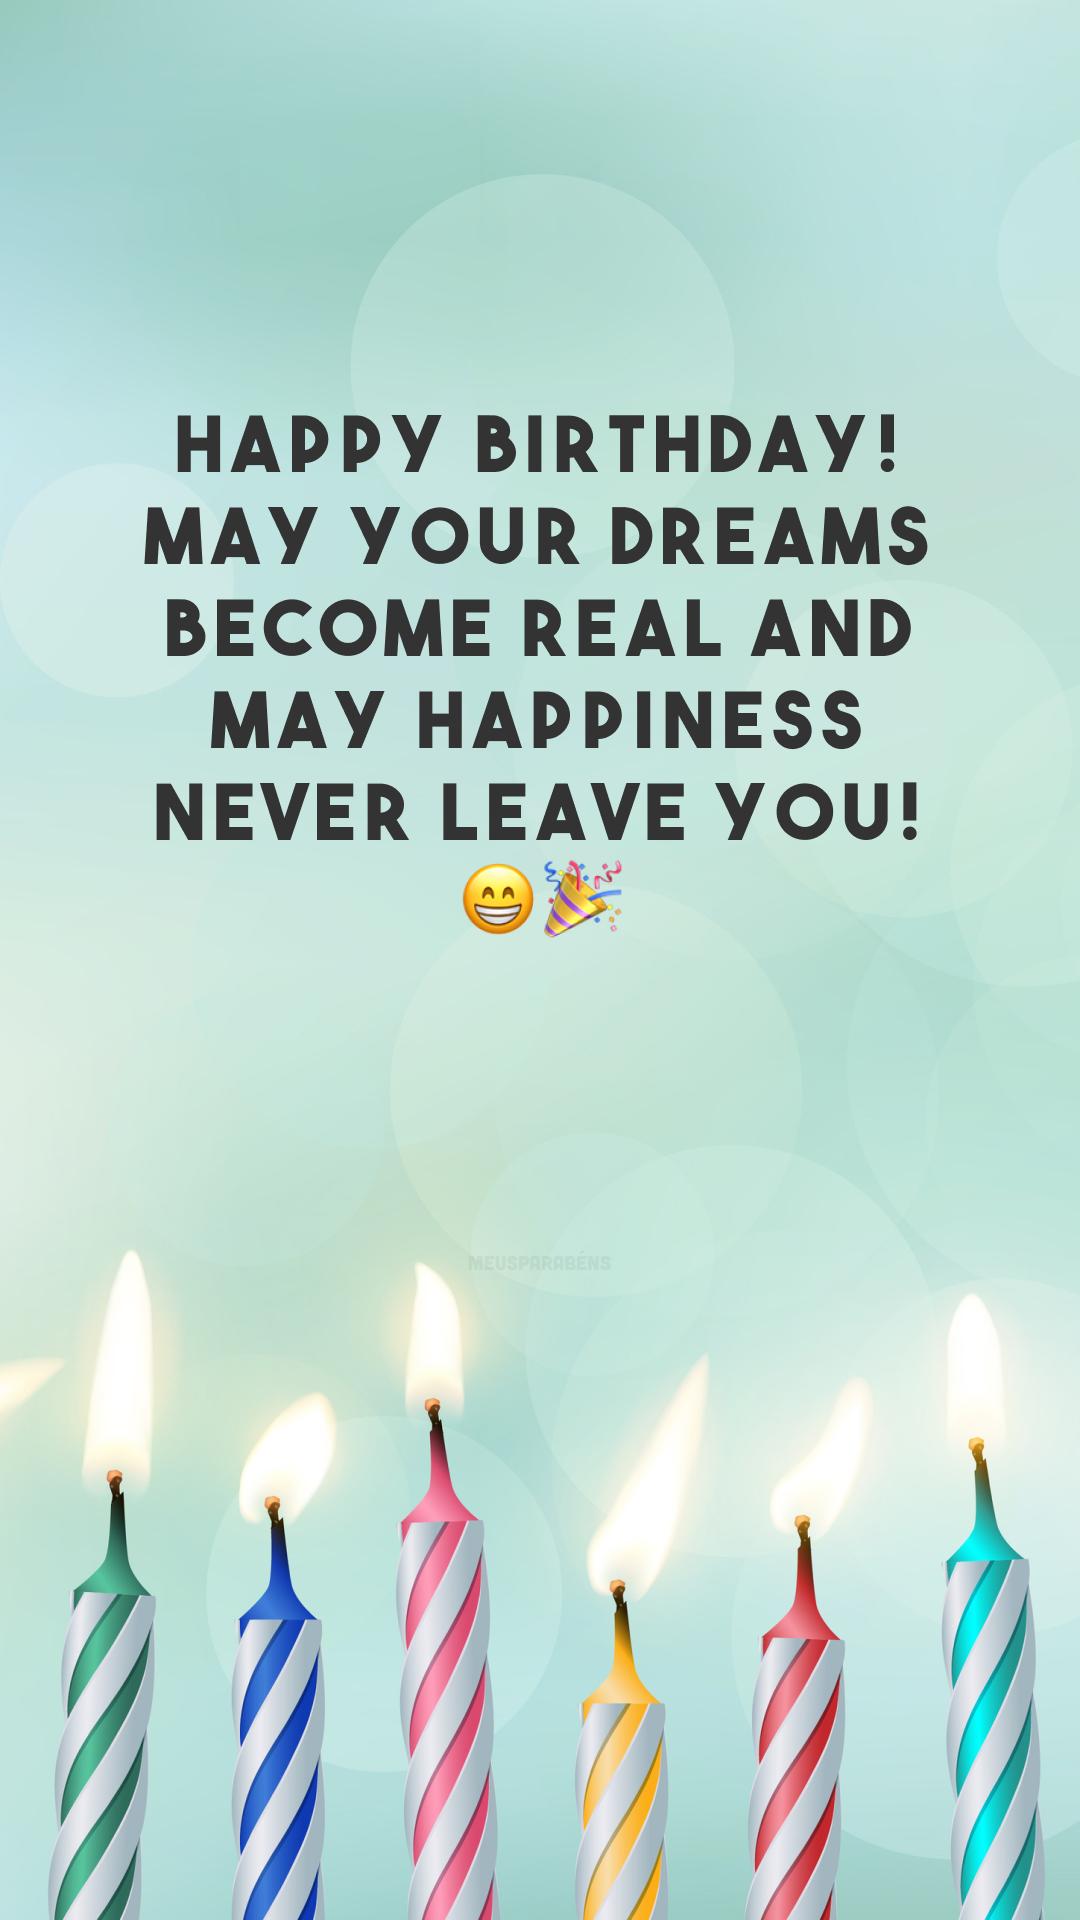 Happy birthday! May your dreams become real and may happiness never leave you! 😁🎉 (Feliz aniversário! Que seus sonhos se tornem reais e que a felicidade nunca te abandone!)